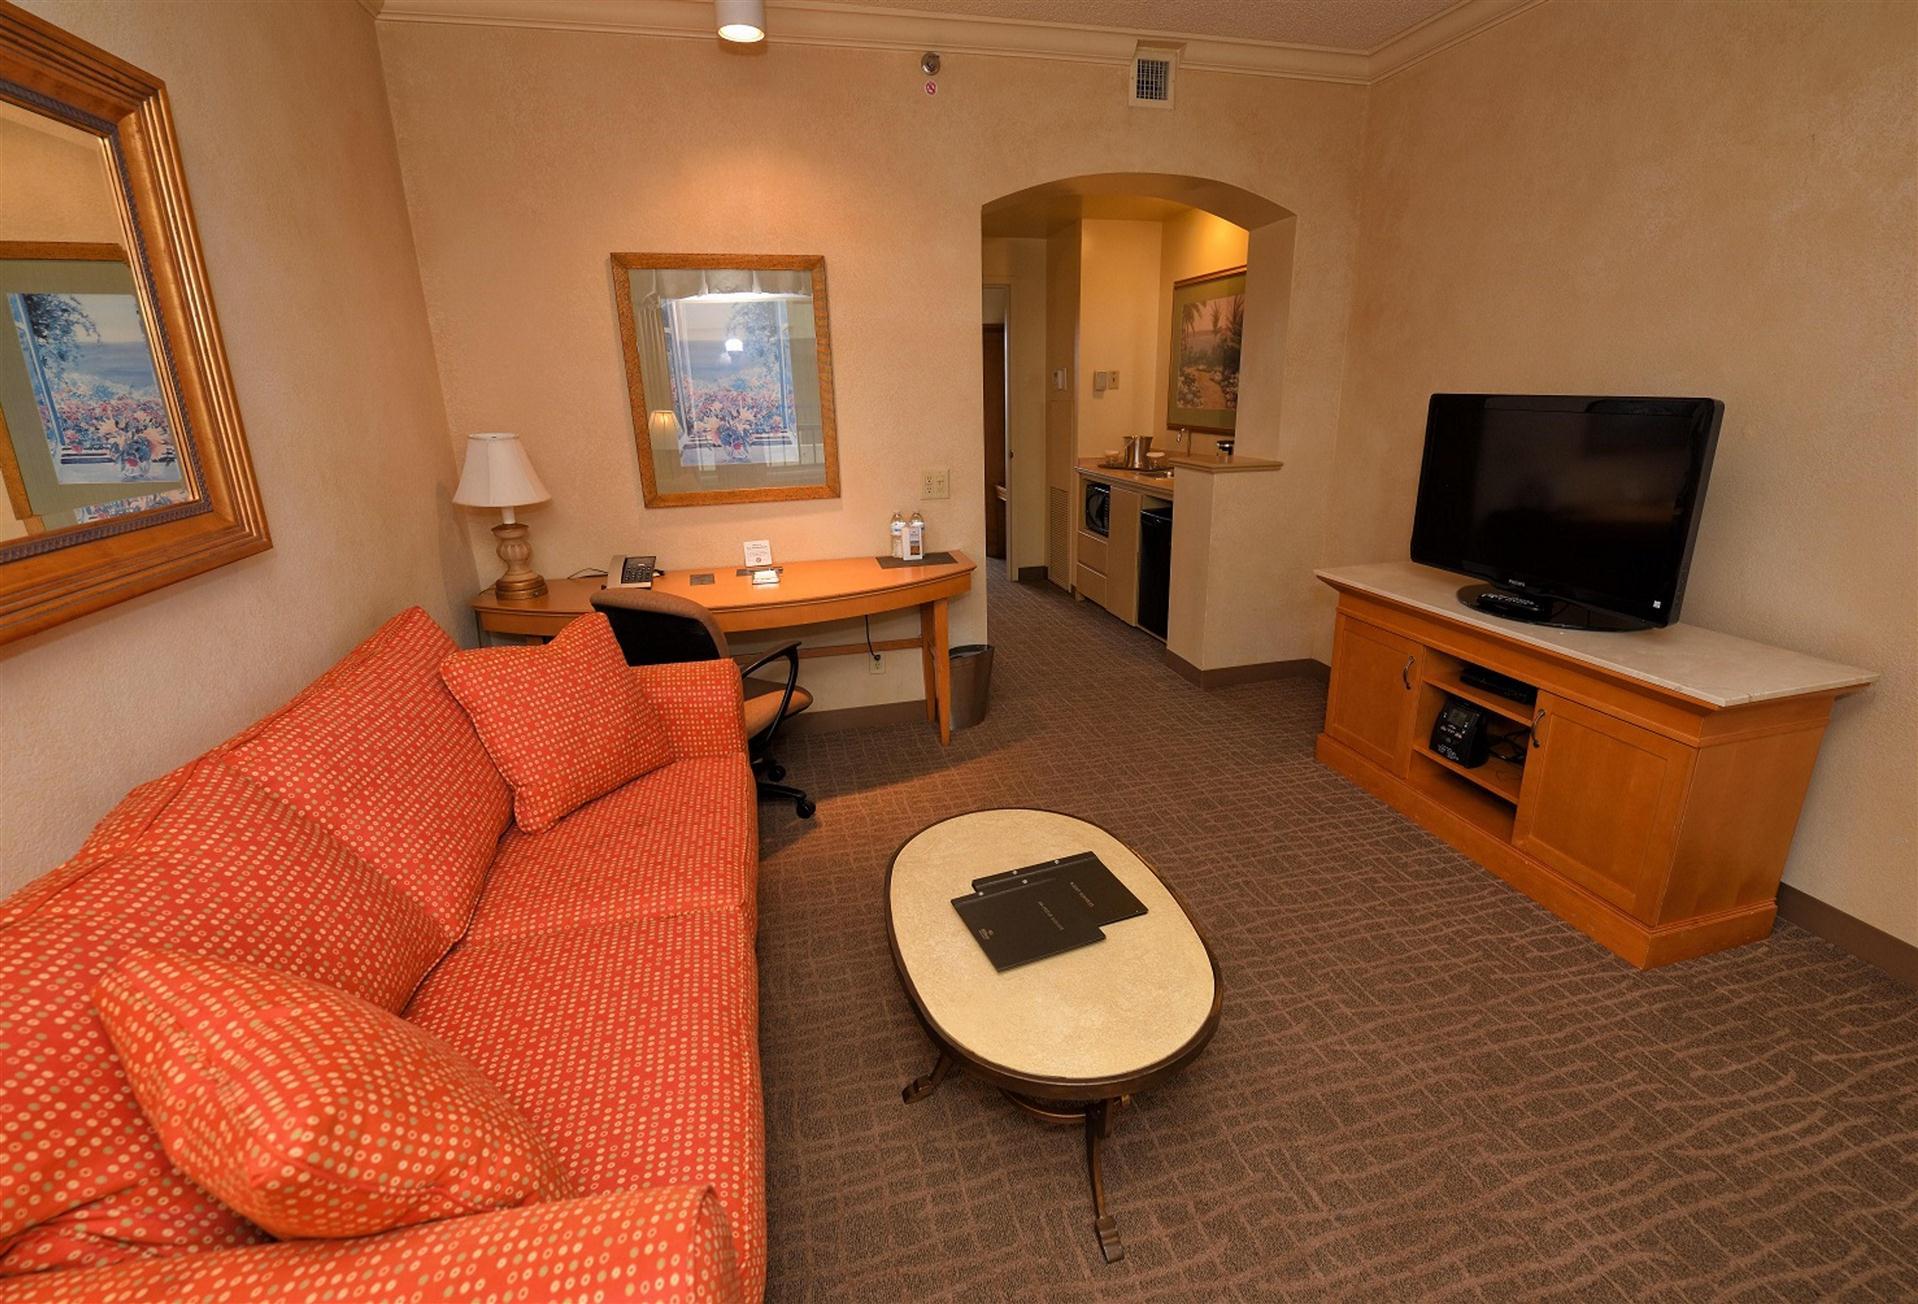 Meetings and Events at Hilton Boca Raton Suites, Boca Raton, FL, US